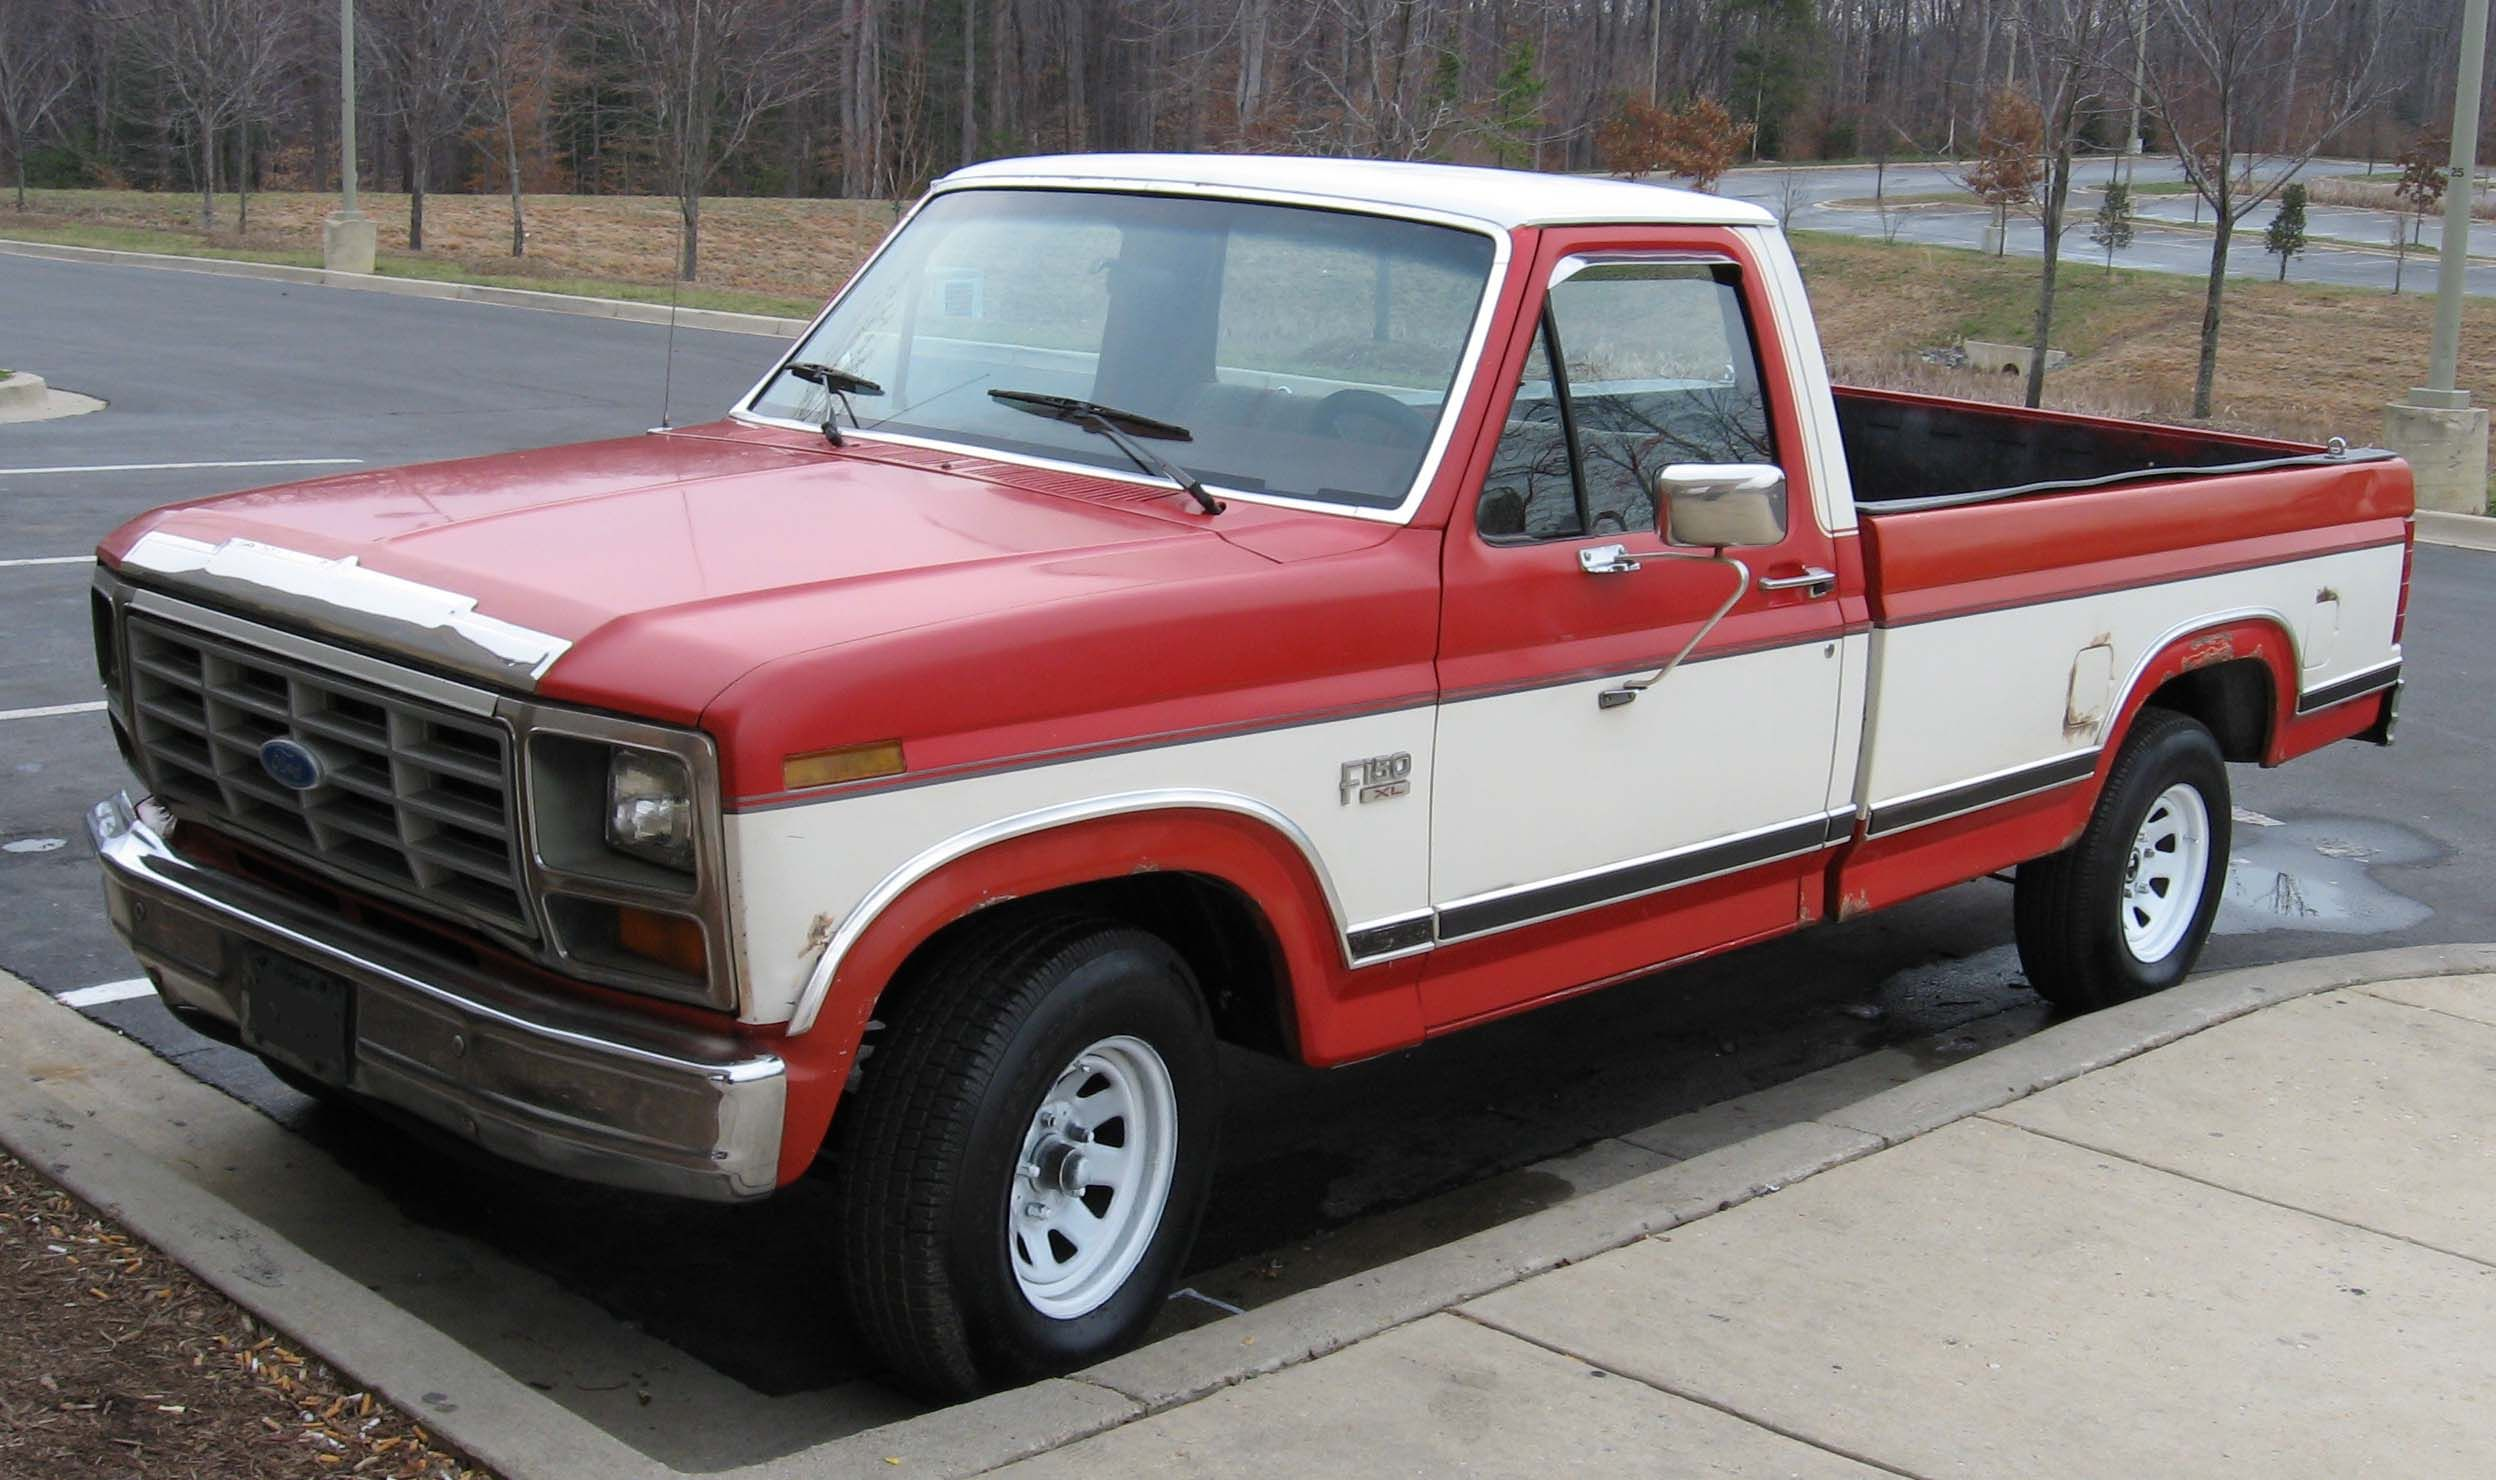 17 Best images about F 150 on Pinterest | Trucks, Ford ranger ...